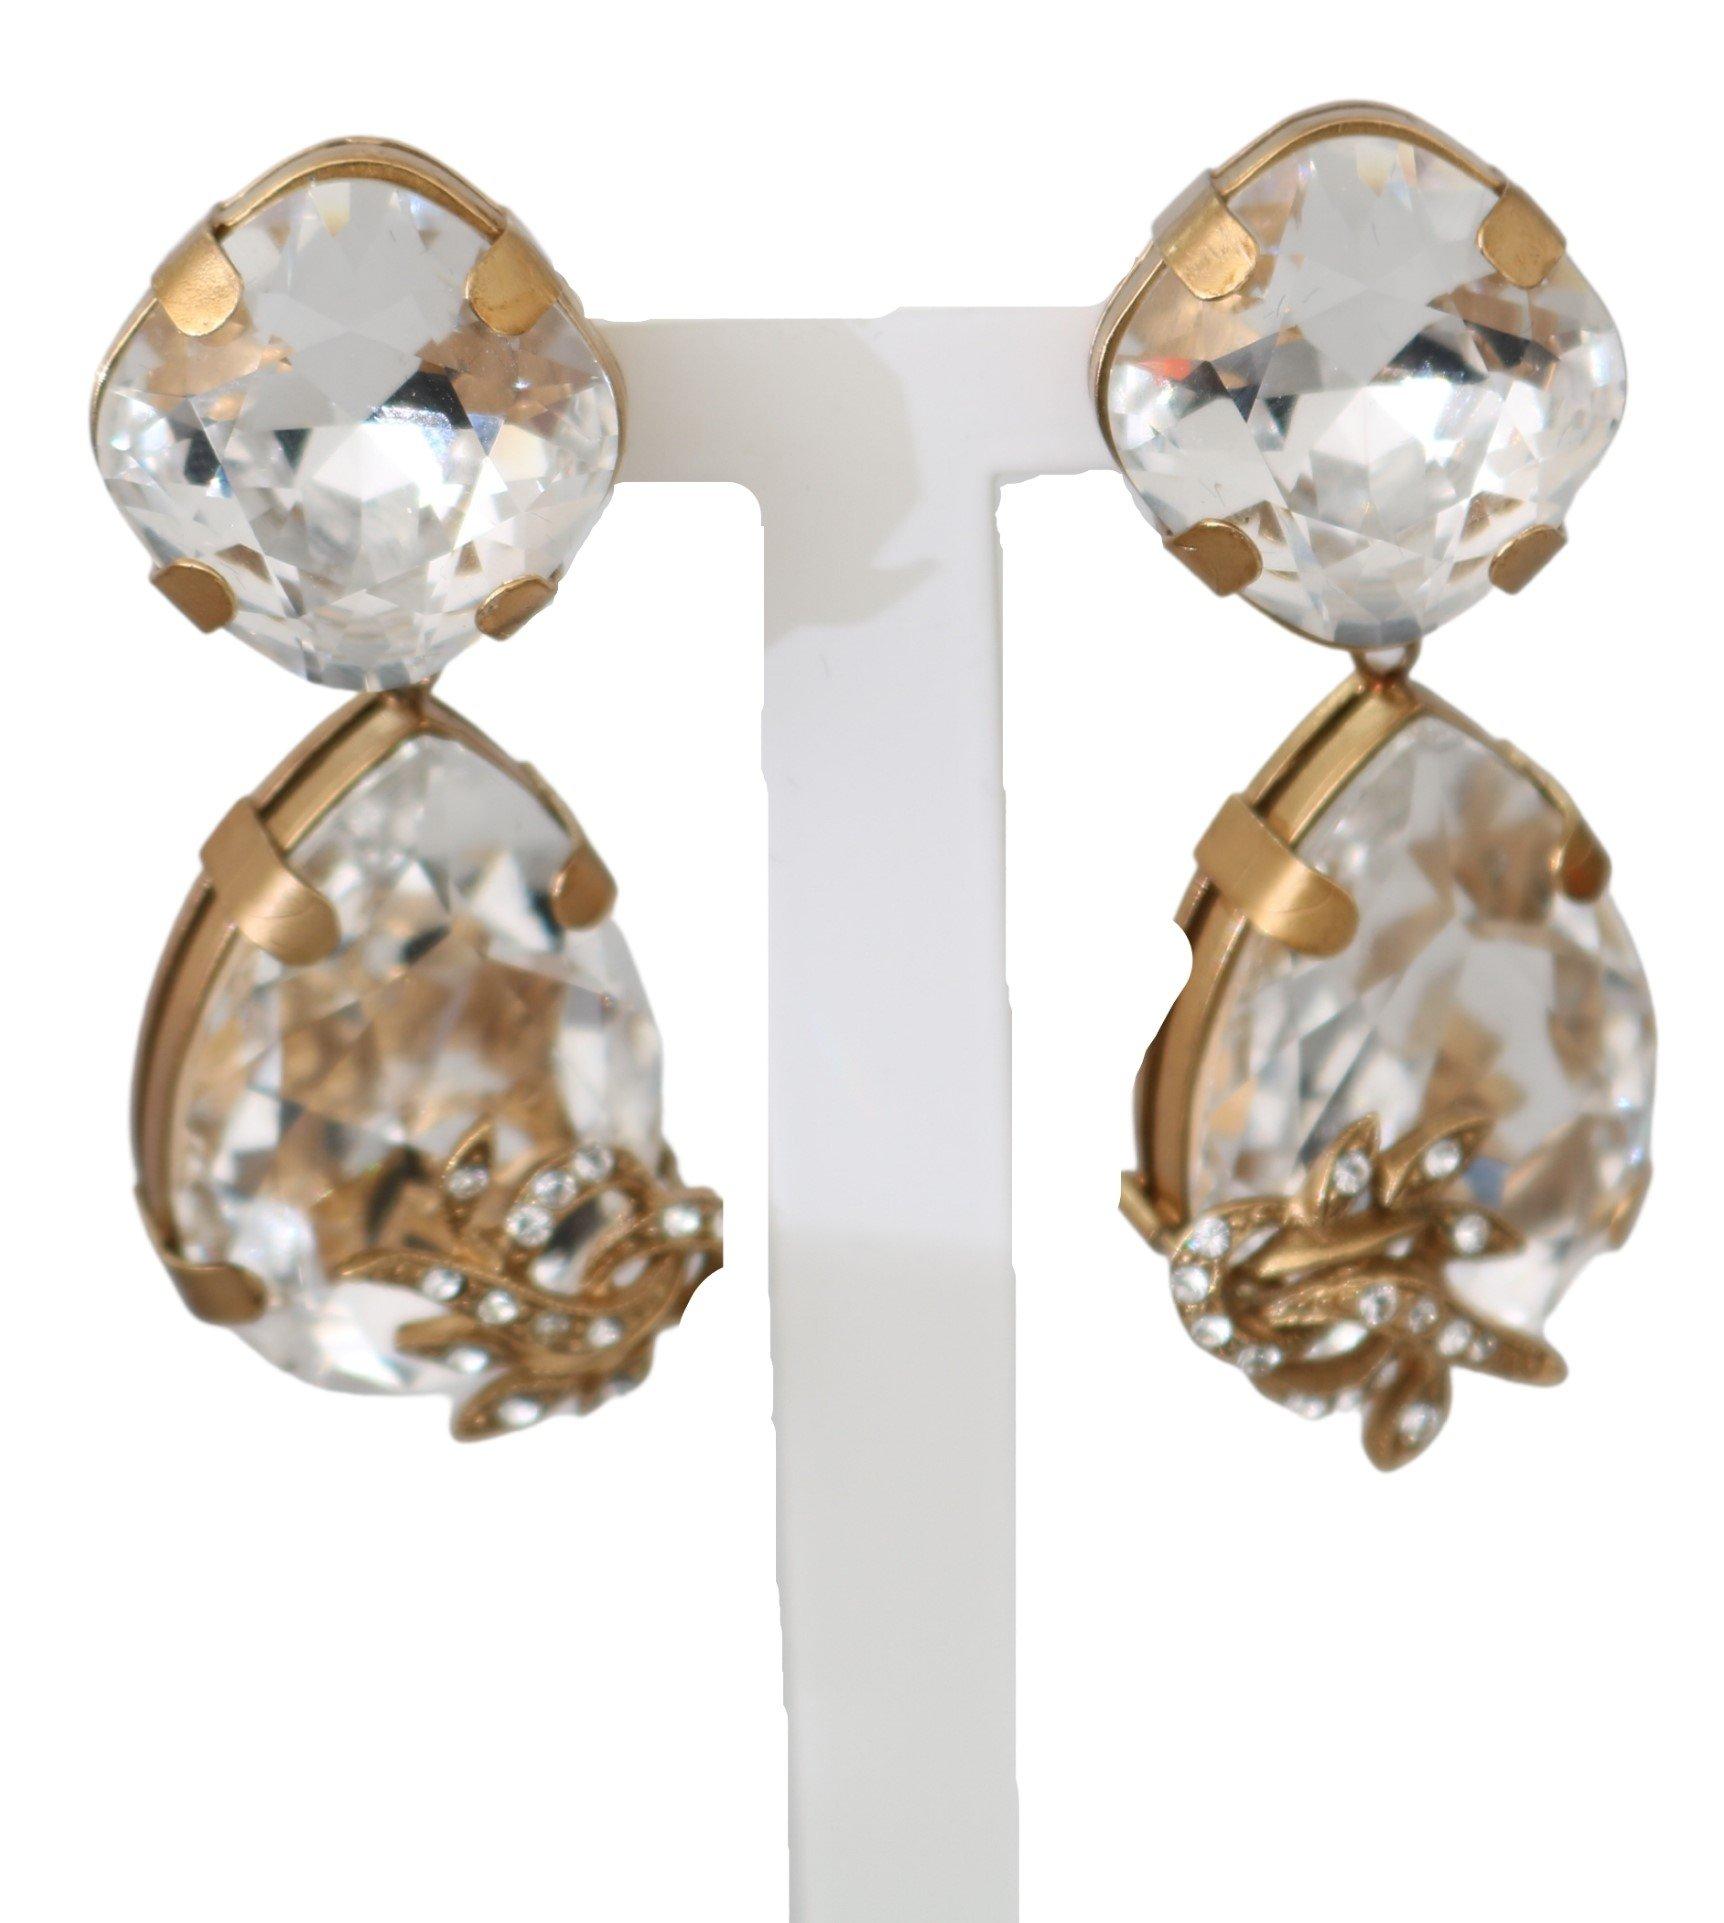 Dolce & Gabbana Women's Brass Floral Crystal Clip-On Earrings Gold SMY7159